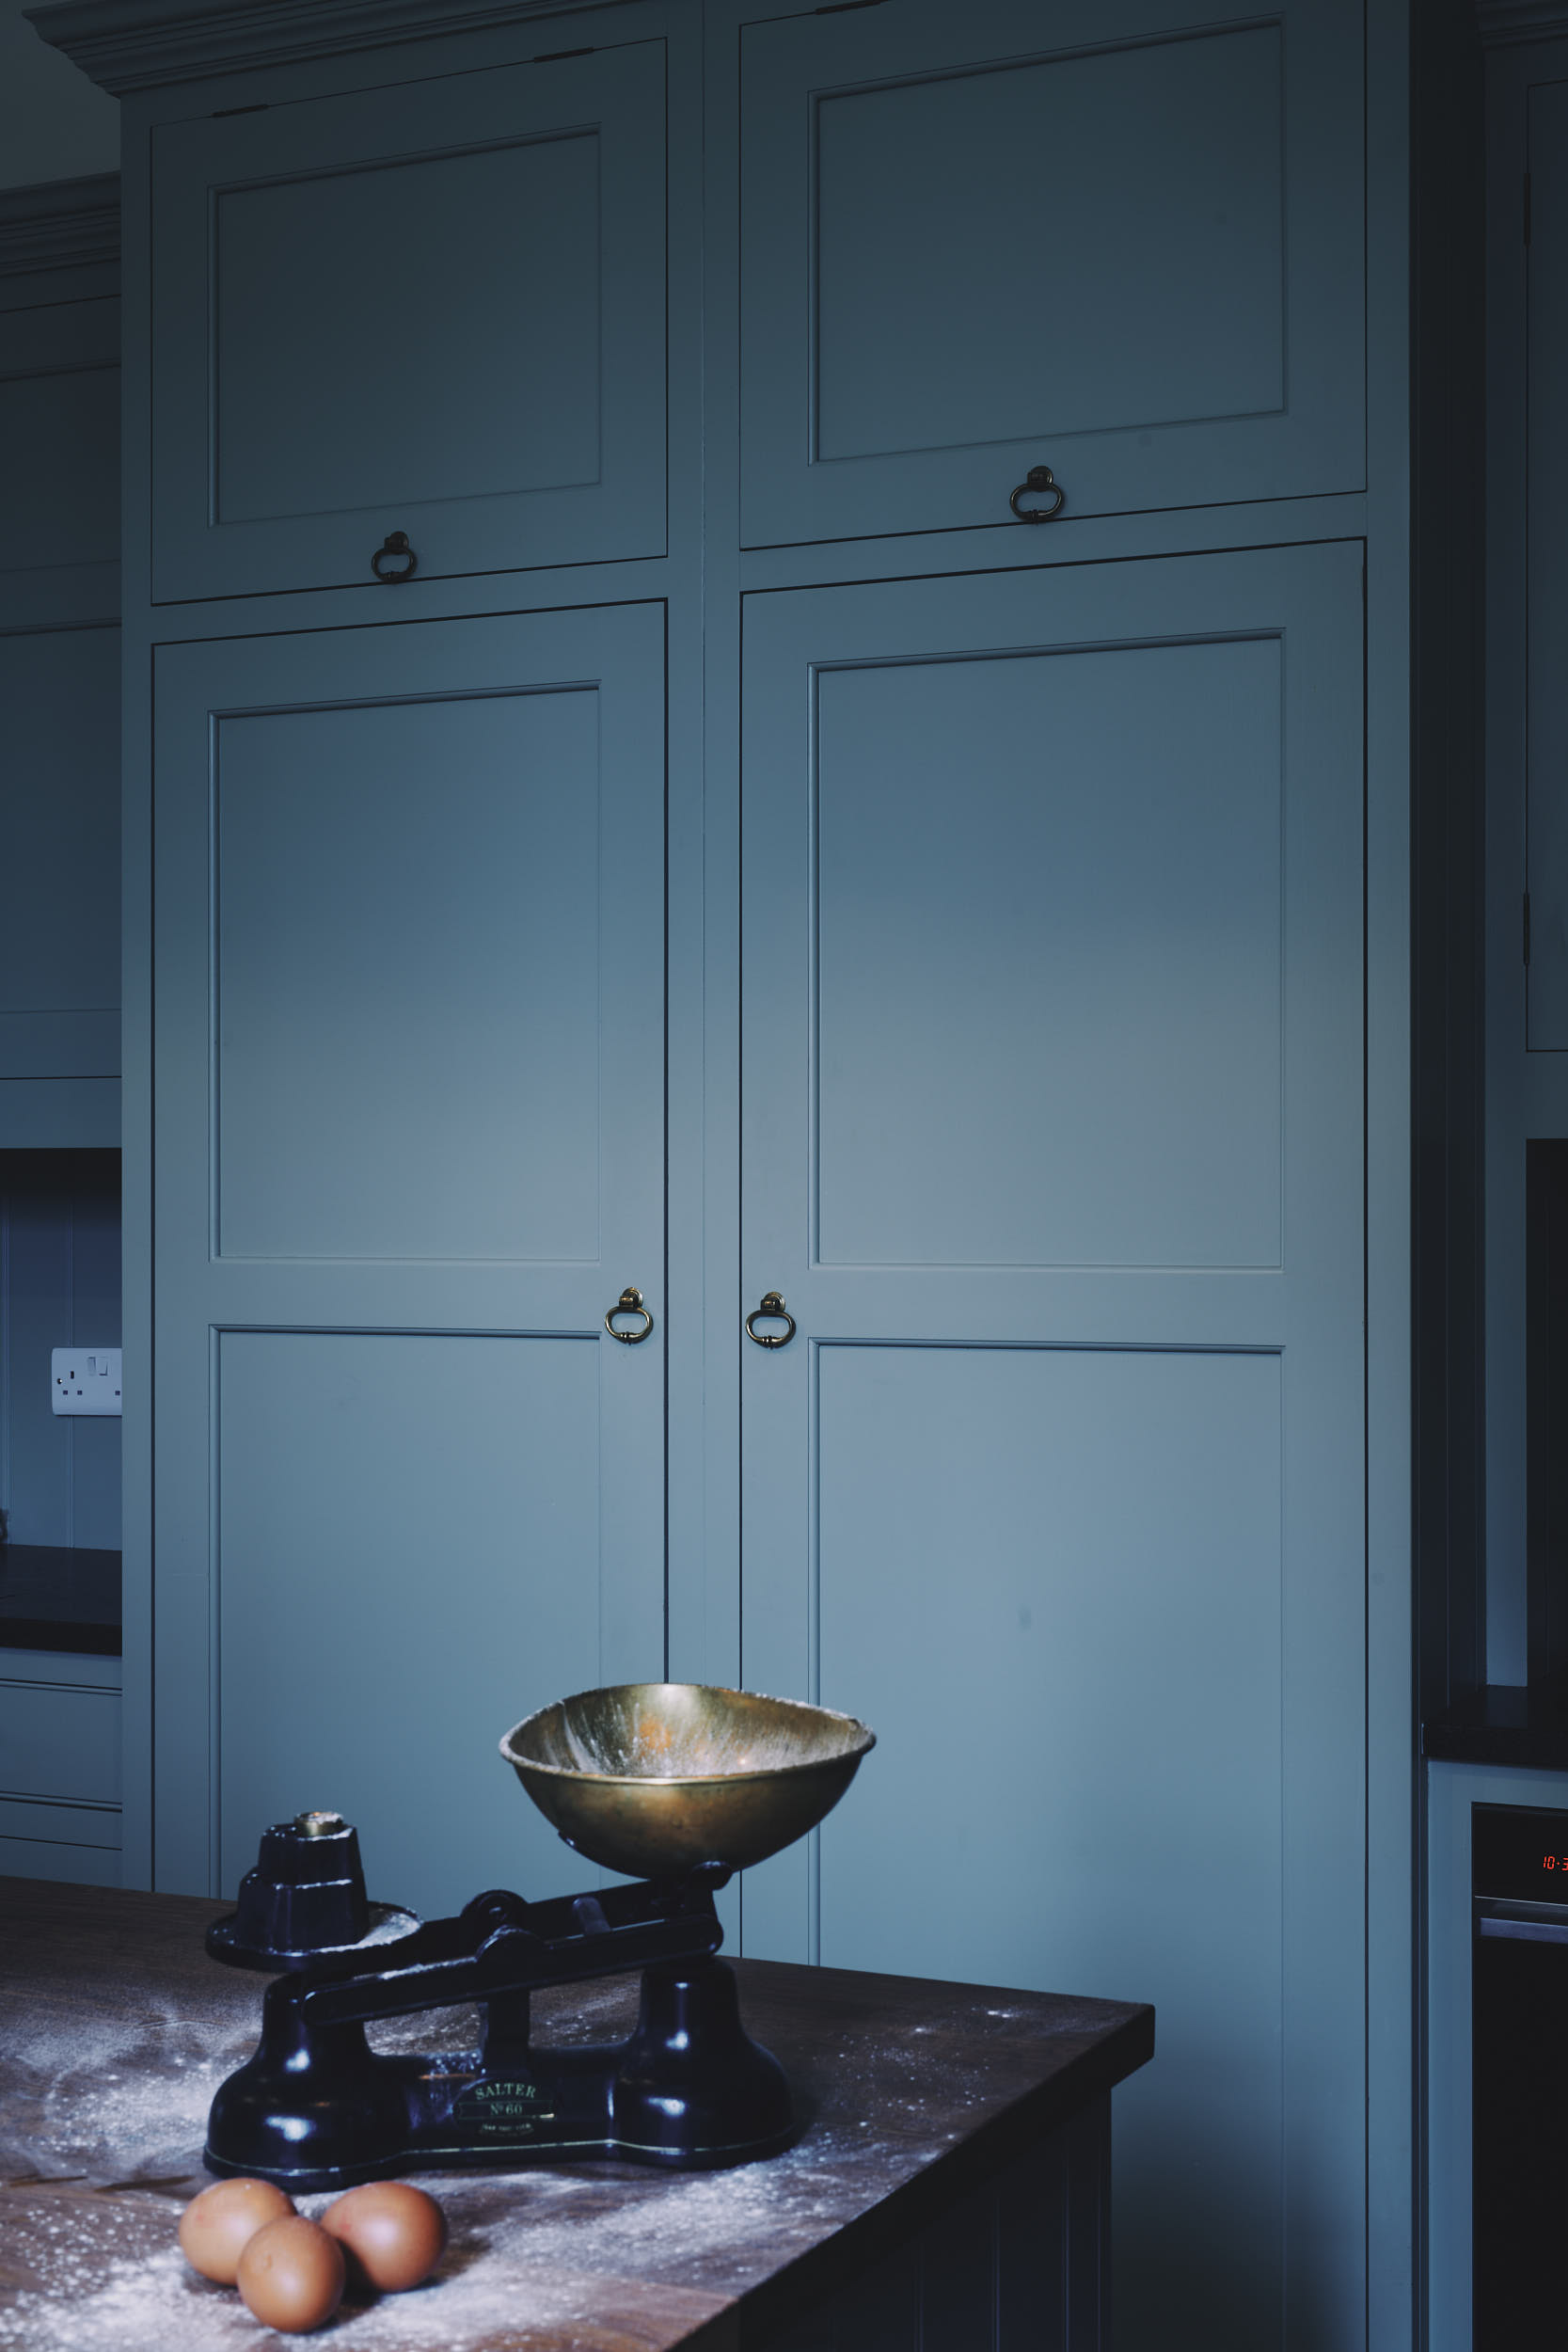 interior photography of luxury bespoke homes by matthew lloyd3160.jpg